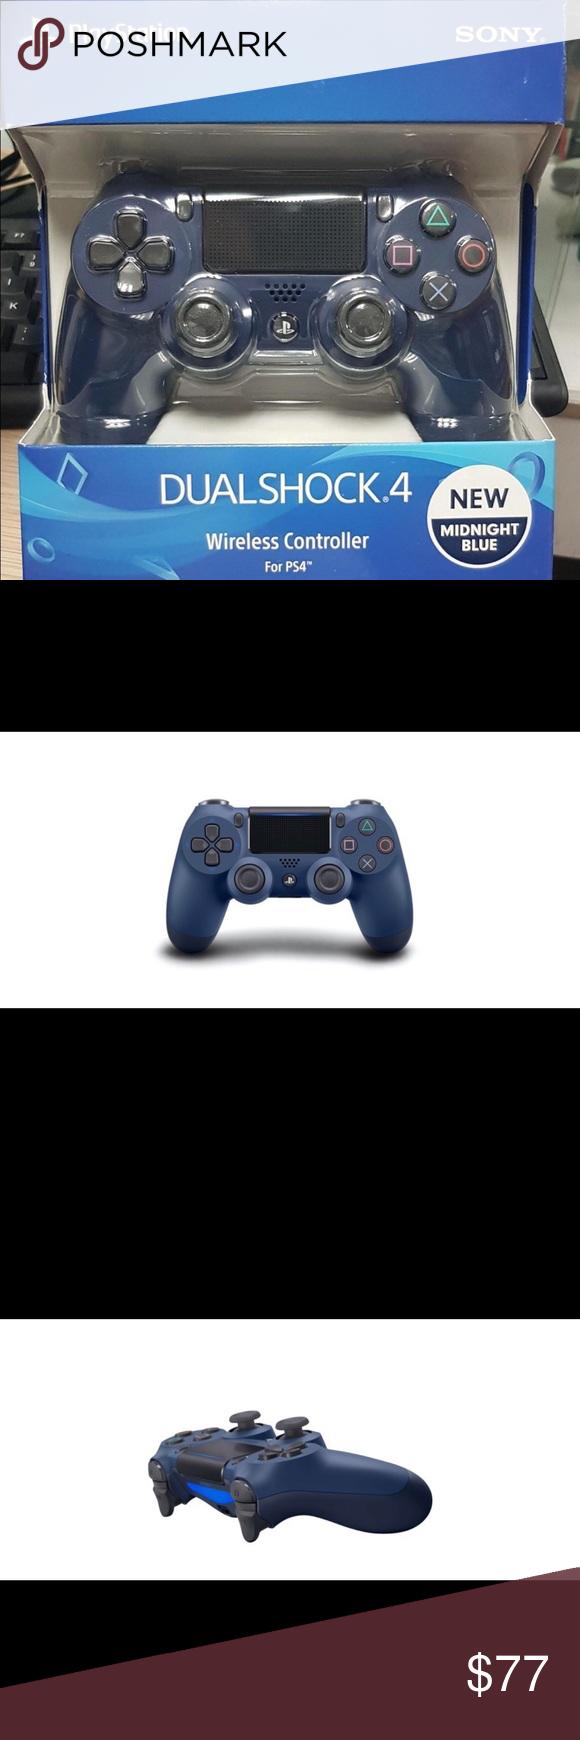 Sony Playstation 4 Dualshock Controller Dualshock Sony Playstation 4